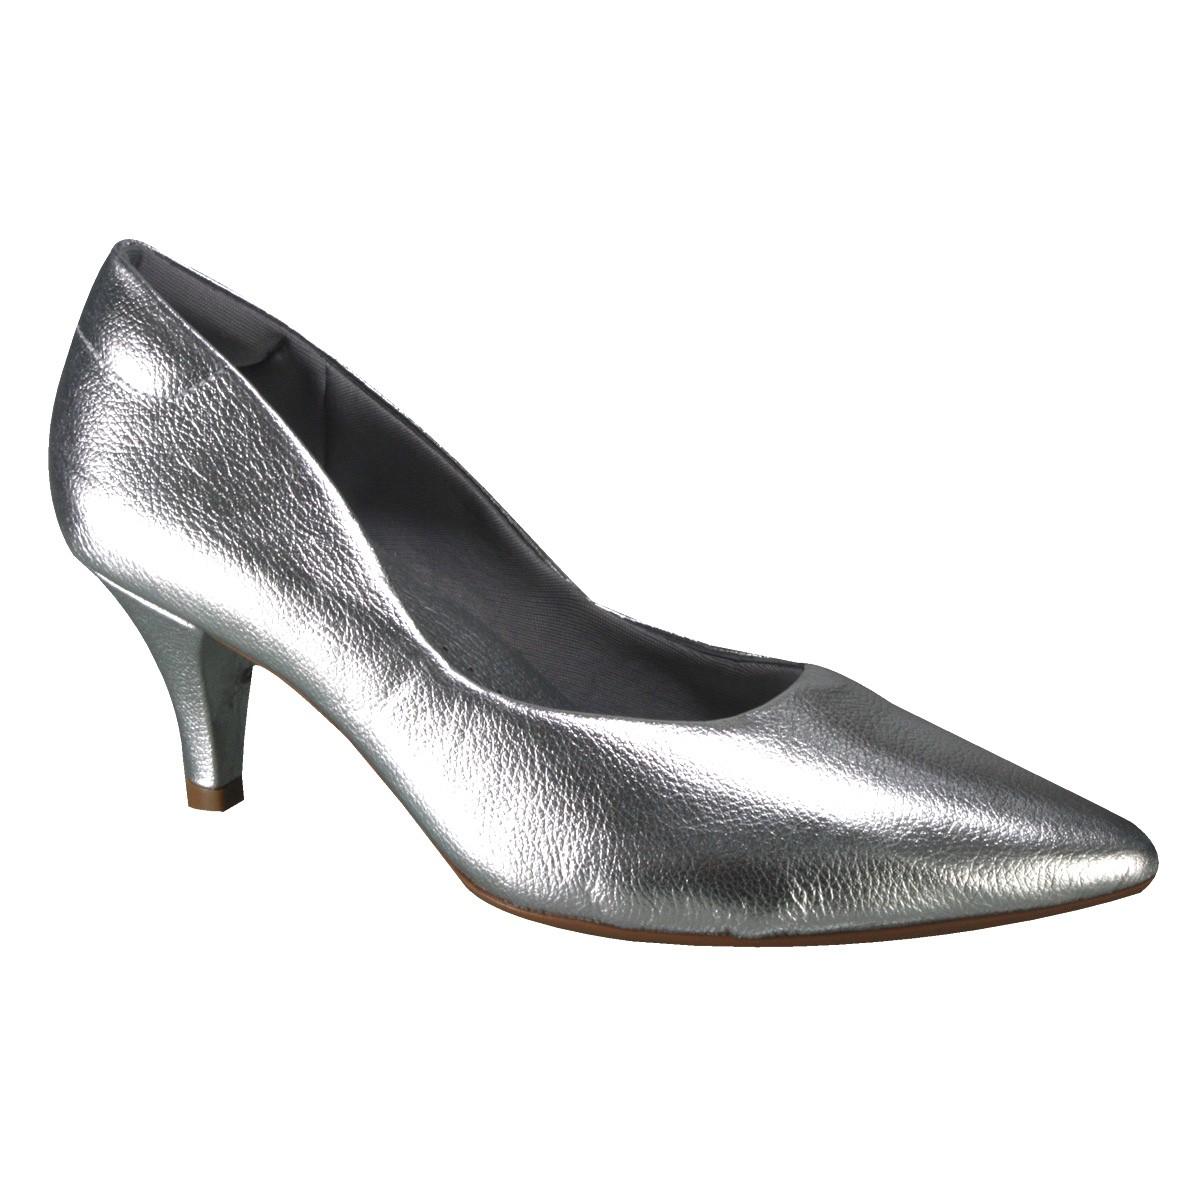 8e41c32569 Sapato Usaflex J6411-10 - Silver Prata (Floter) - Botas Online ...